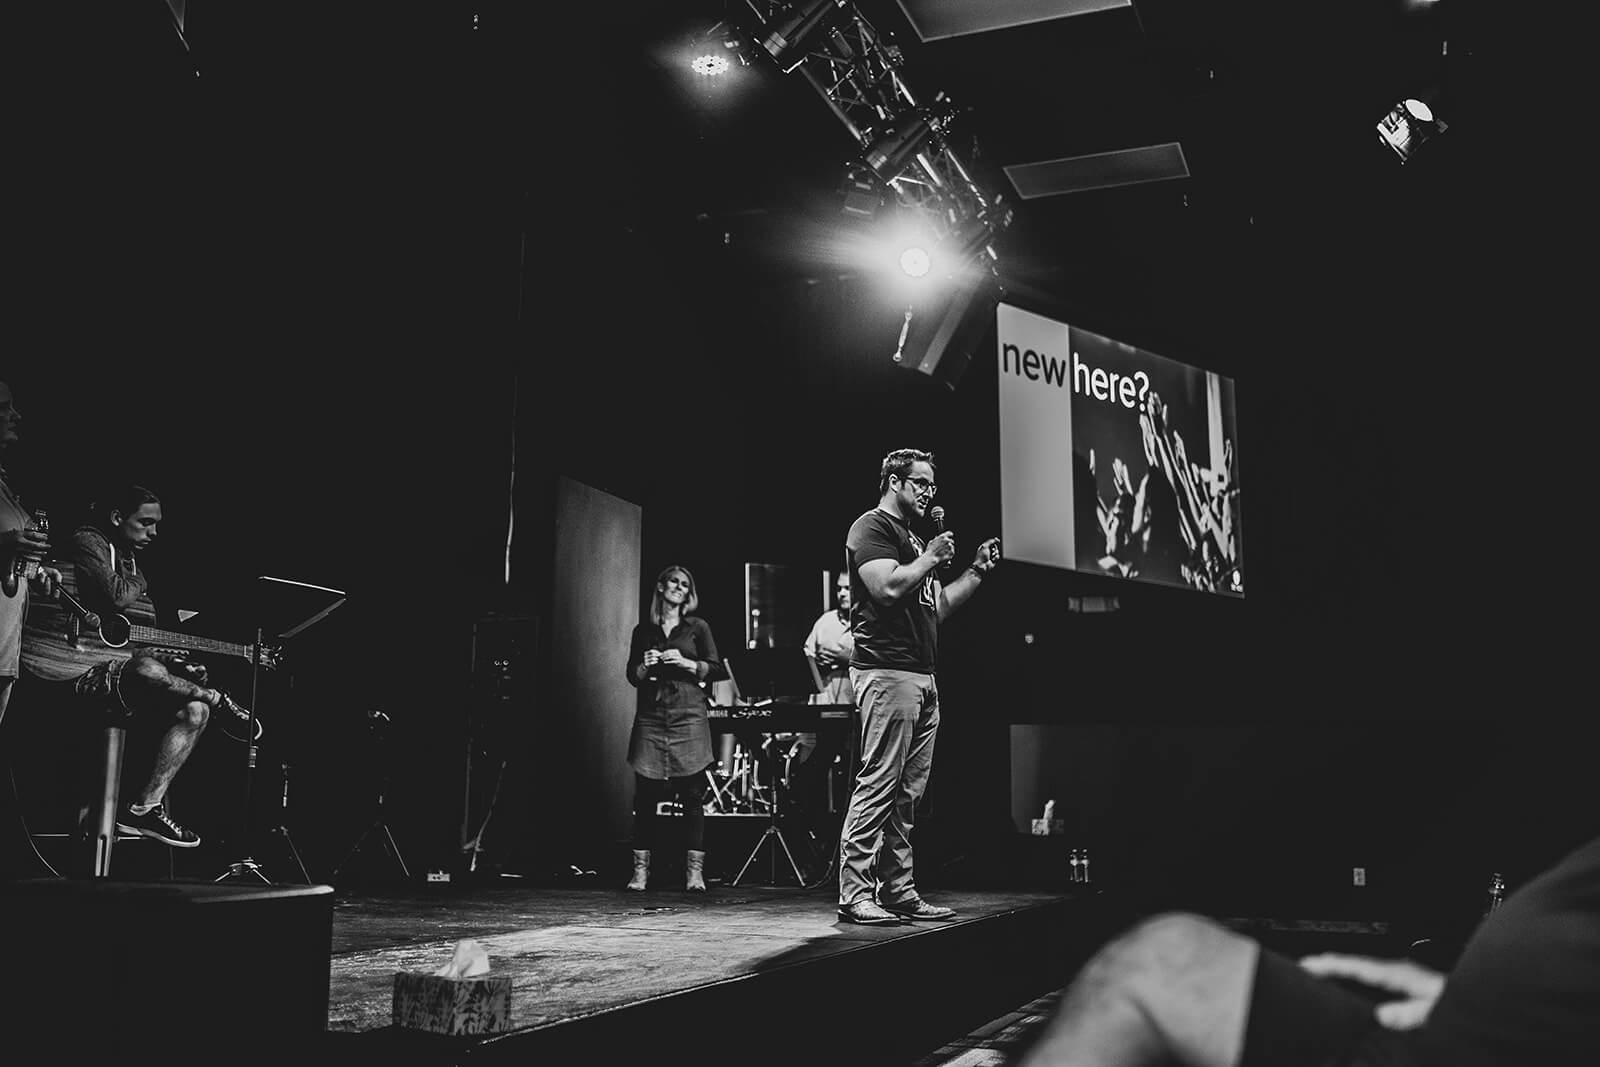 pastor speaking on stage